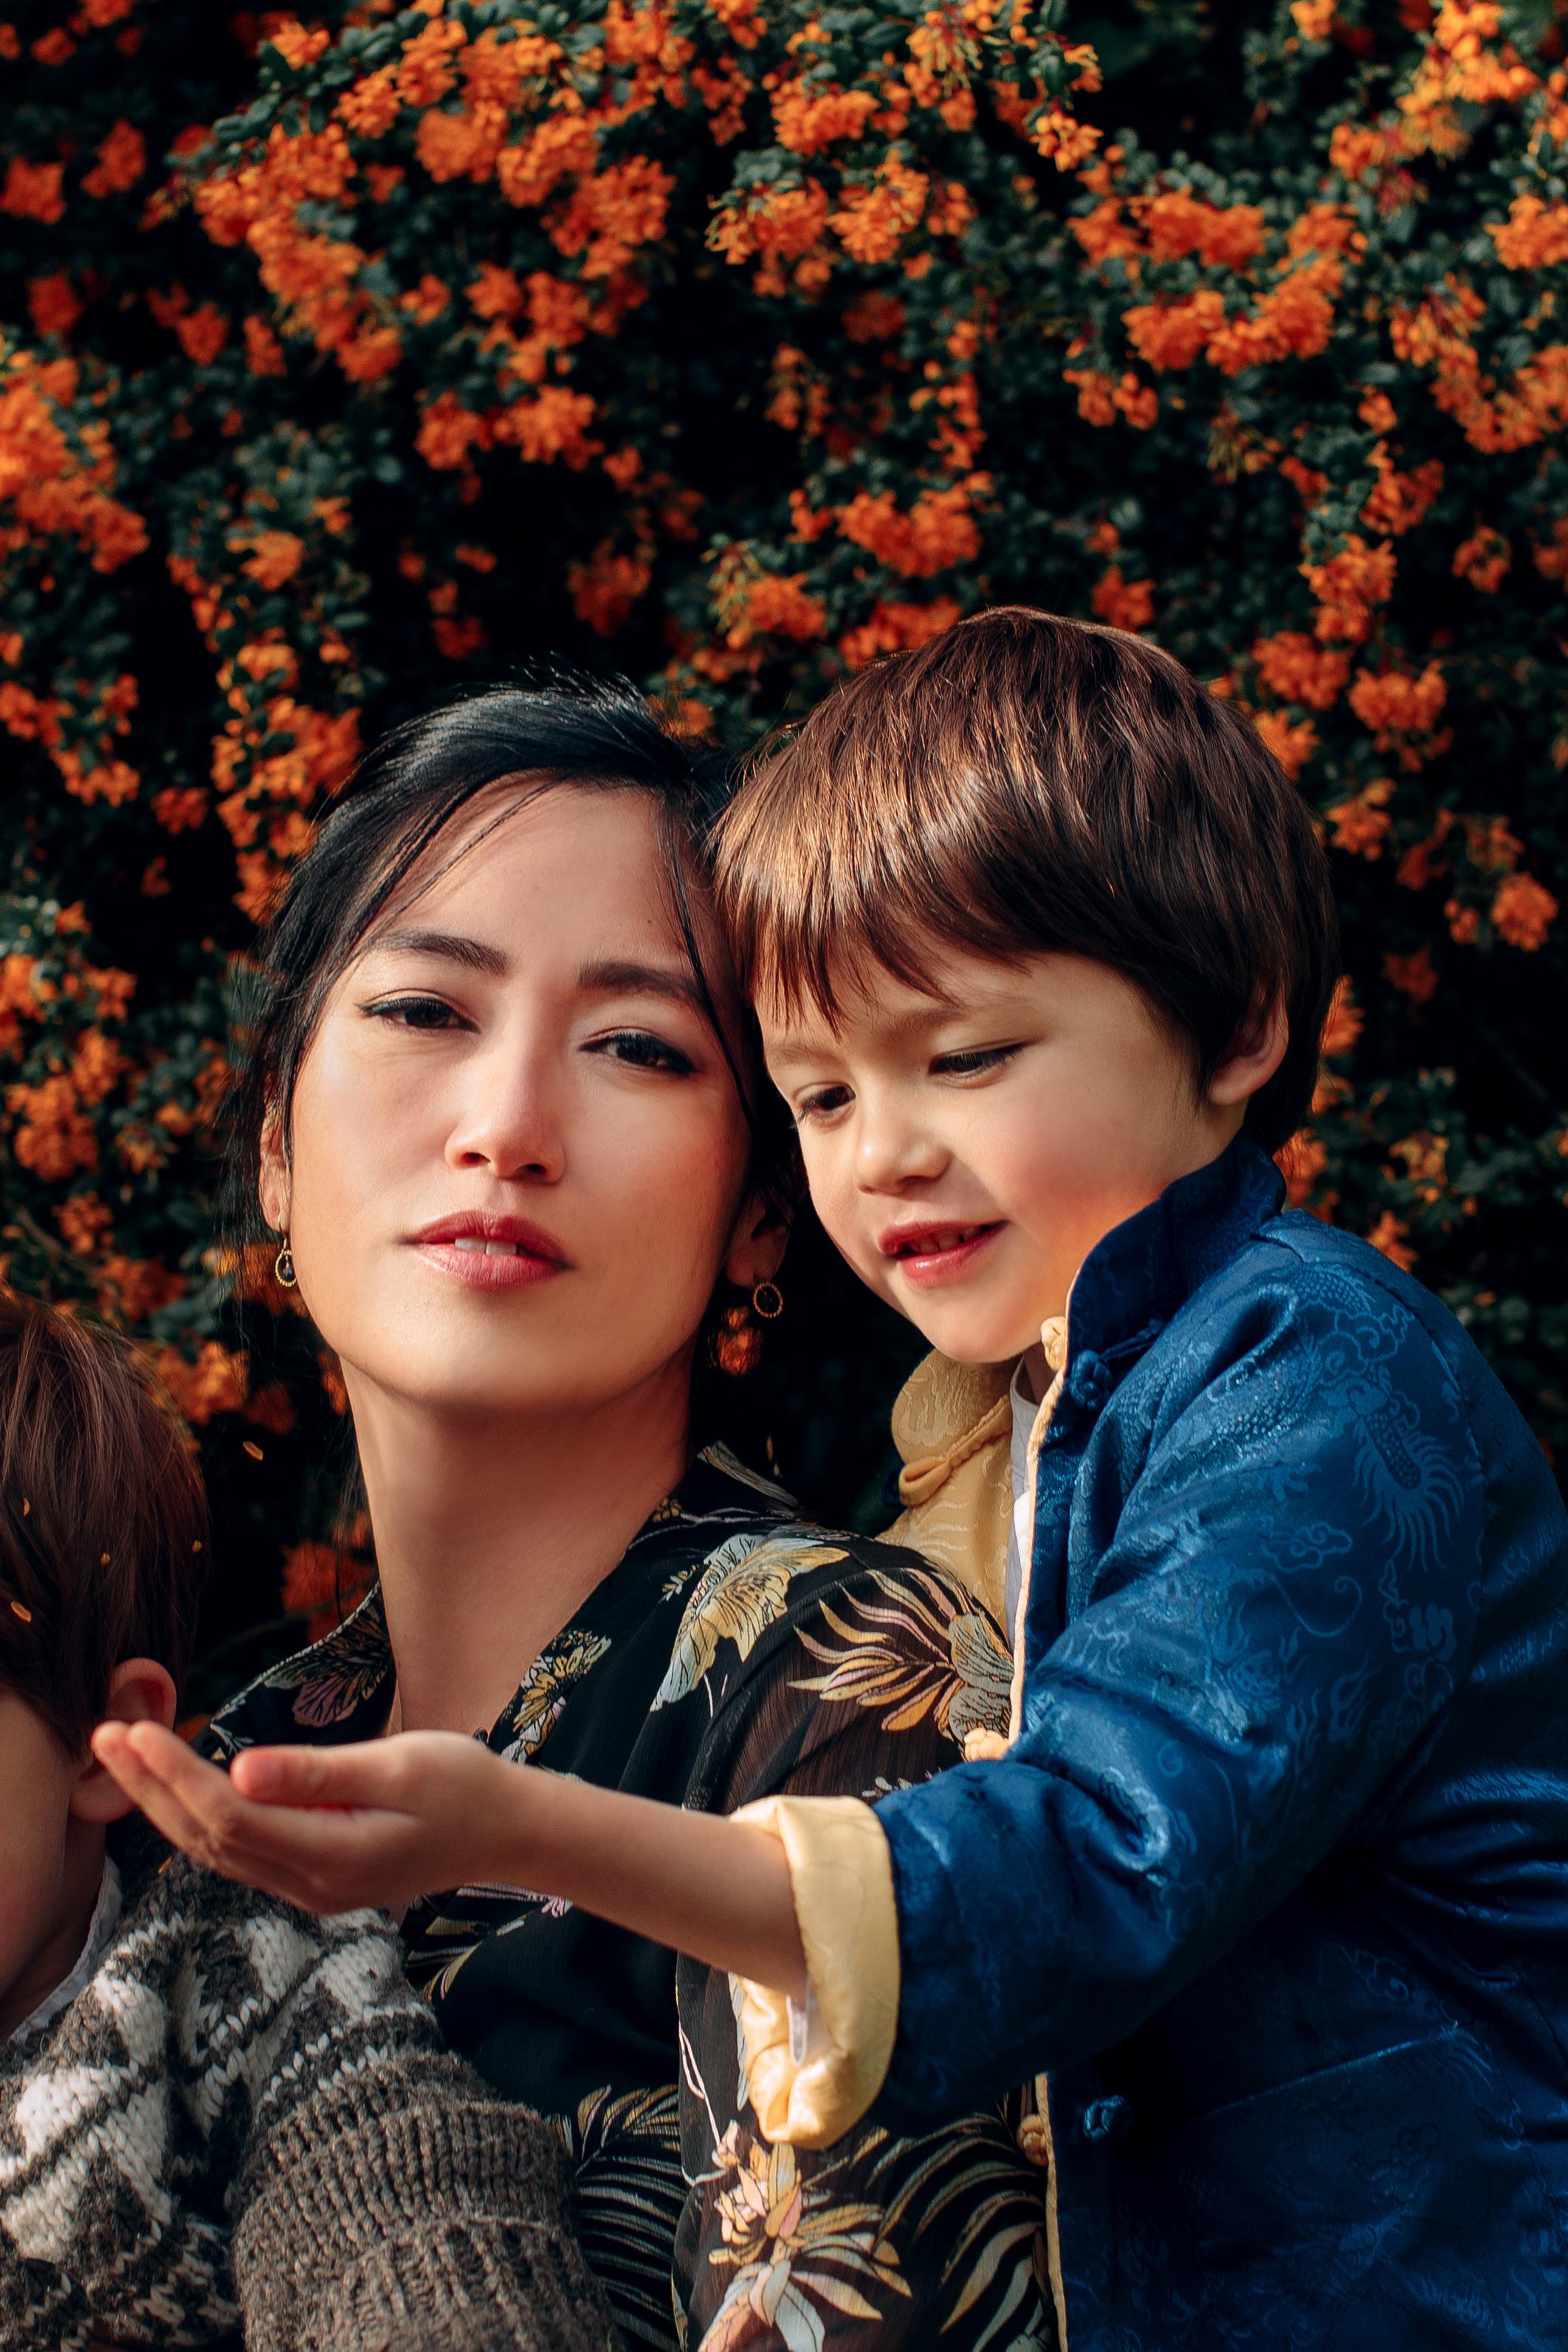 071_bristol-family-portrait-studio.jpg